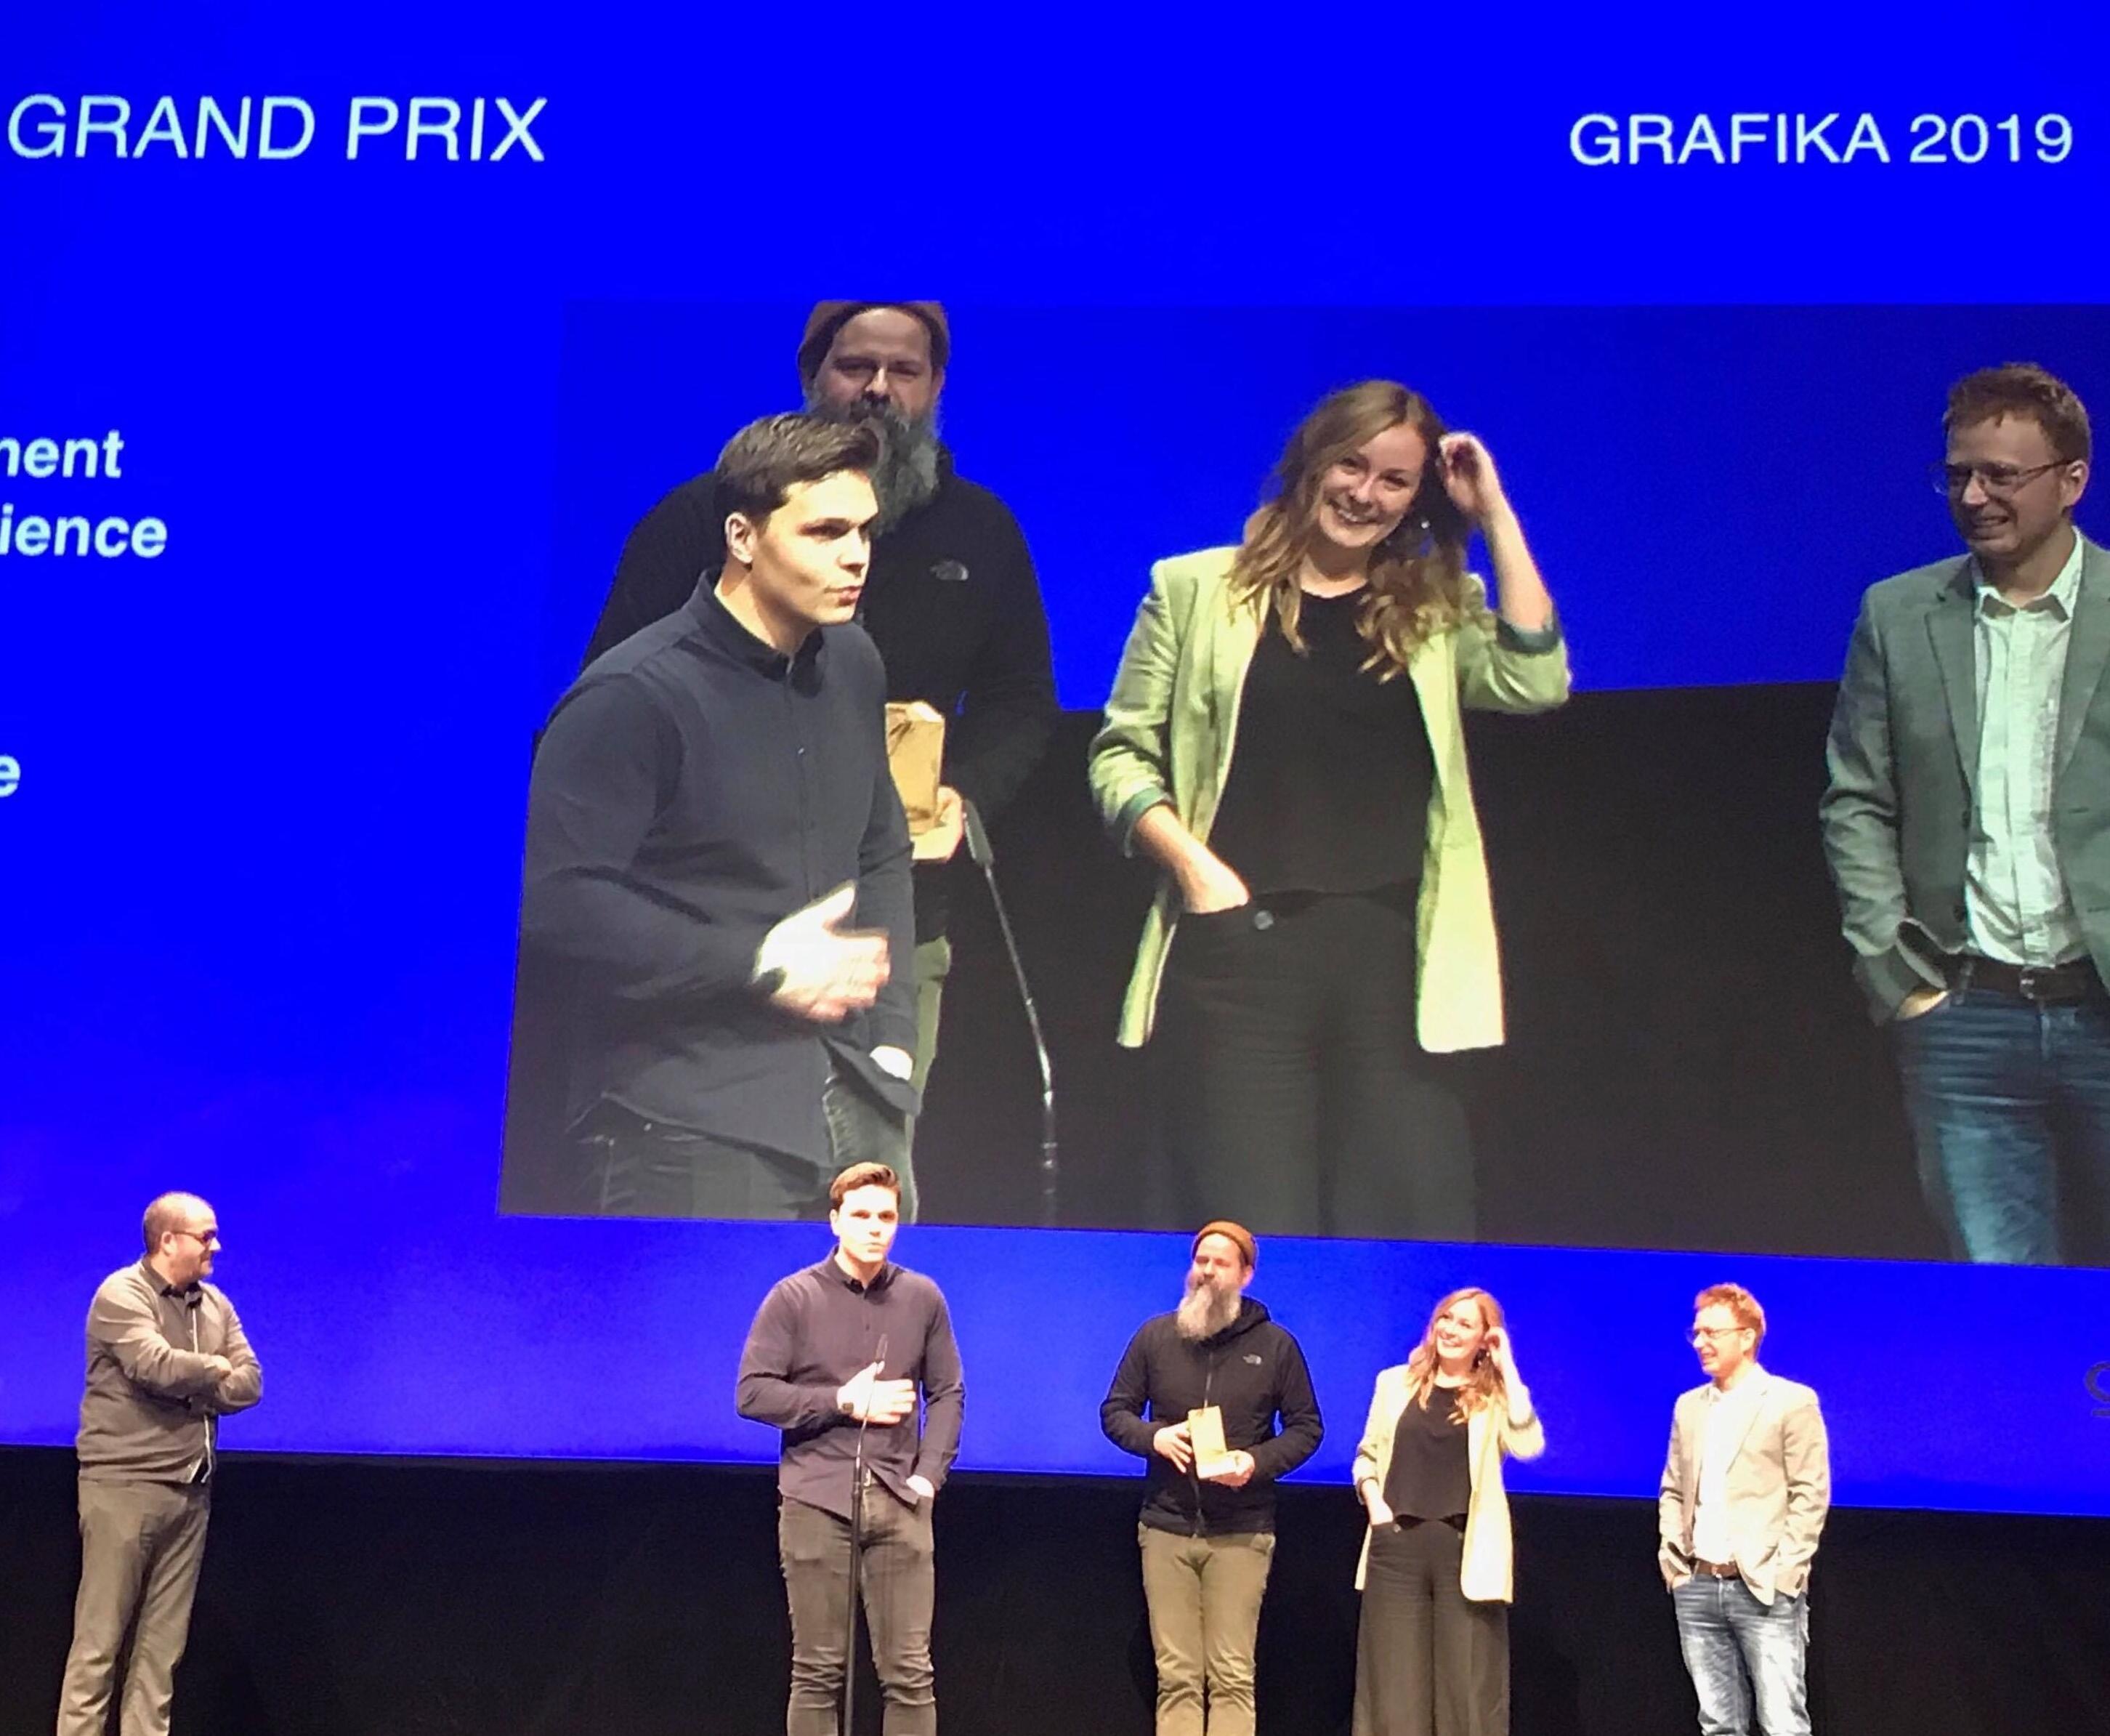 prix grafika 2019 - entreprise Fragment